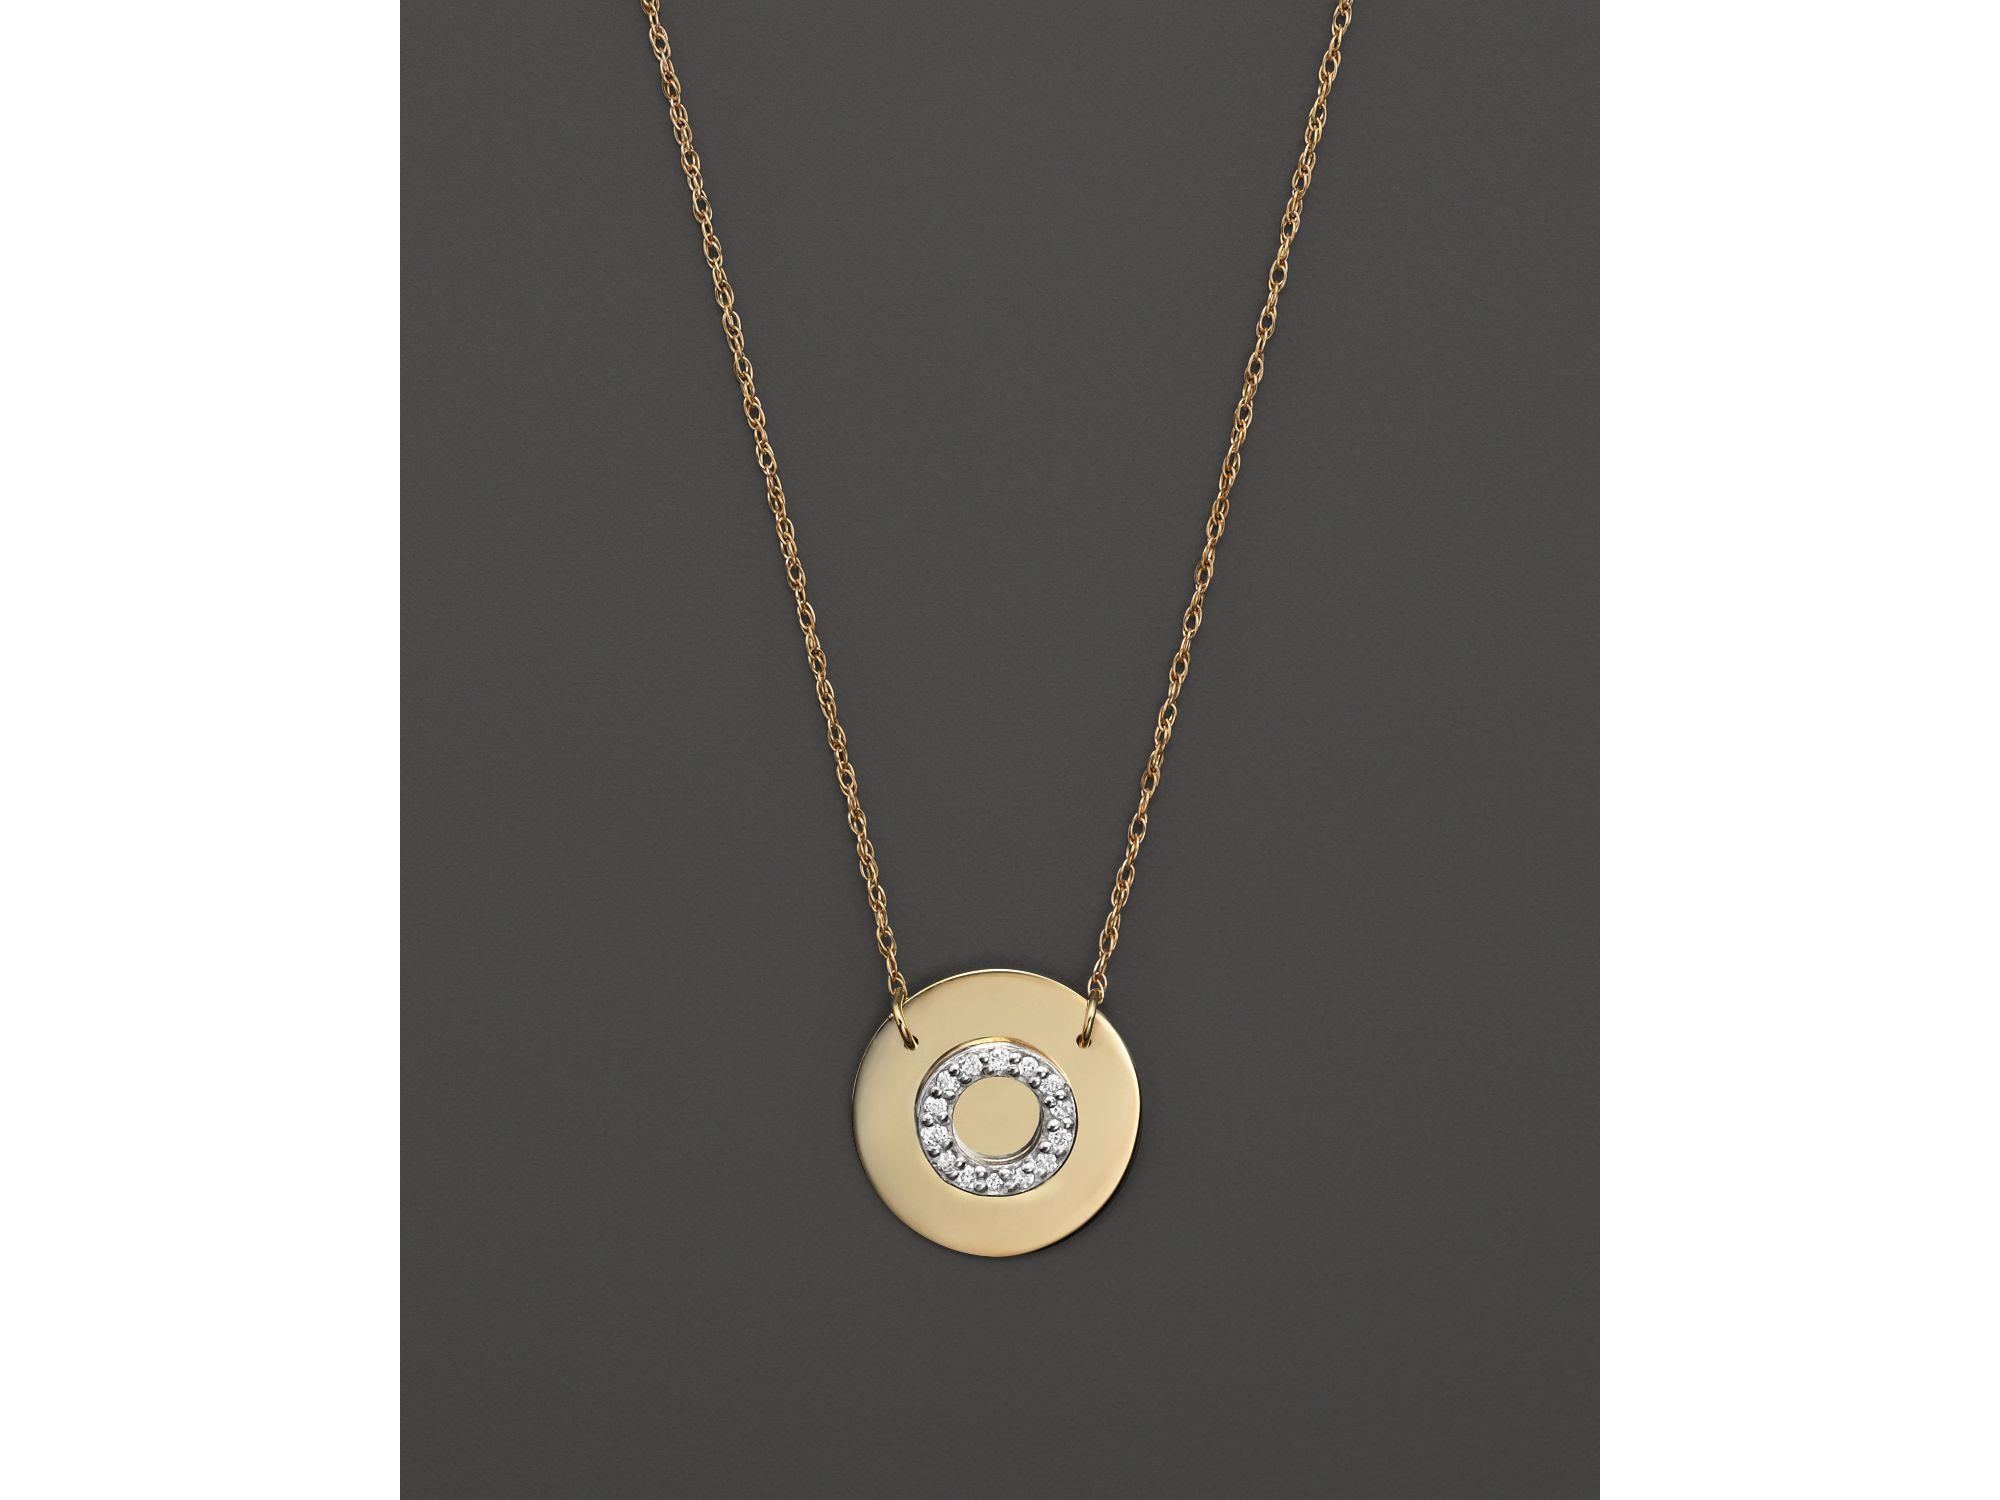 Jane Basch 14k Yellow Gold Circle Disc Pendant Necklace